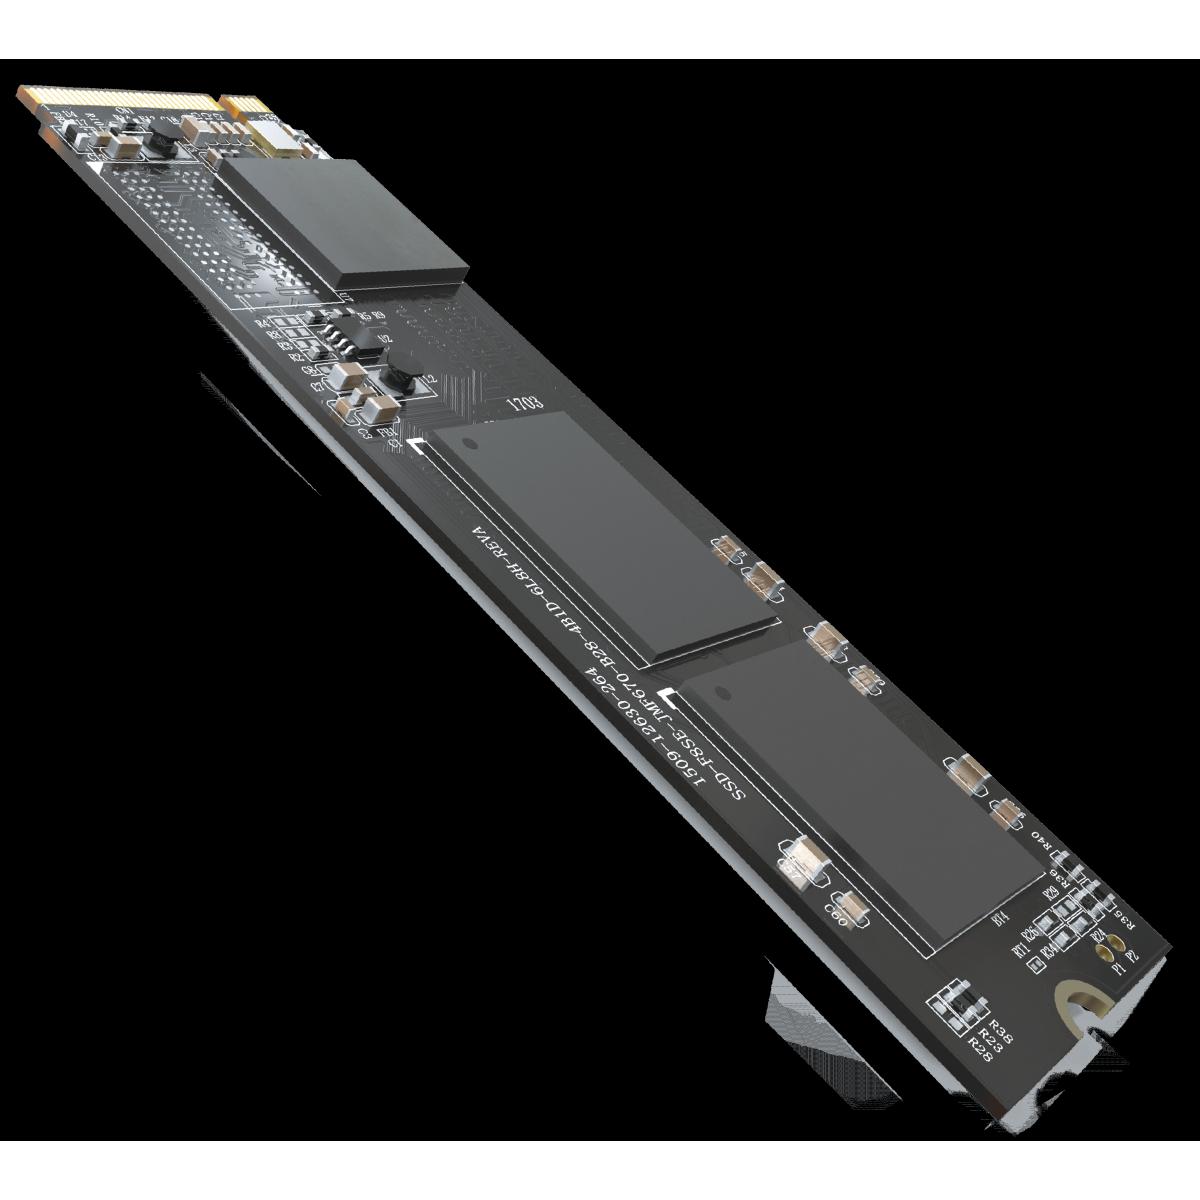 SSD Hikvision Minder, 128GB, M.2 NVMe, Leitura 980MBs e Gravação 620MBs, HS-SSD-Minder(P)/128G